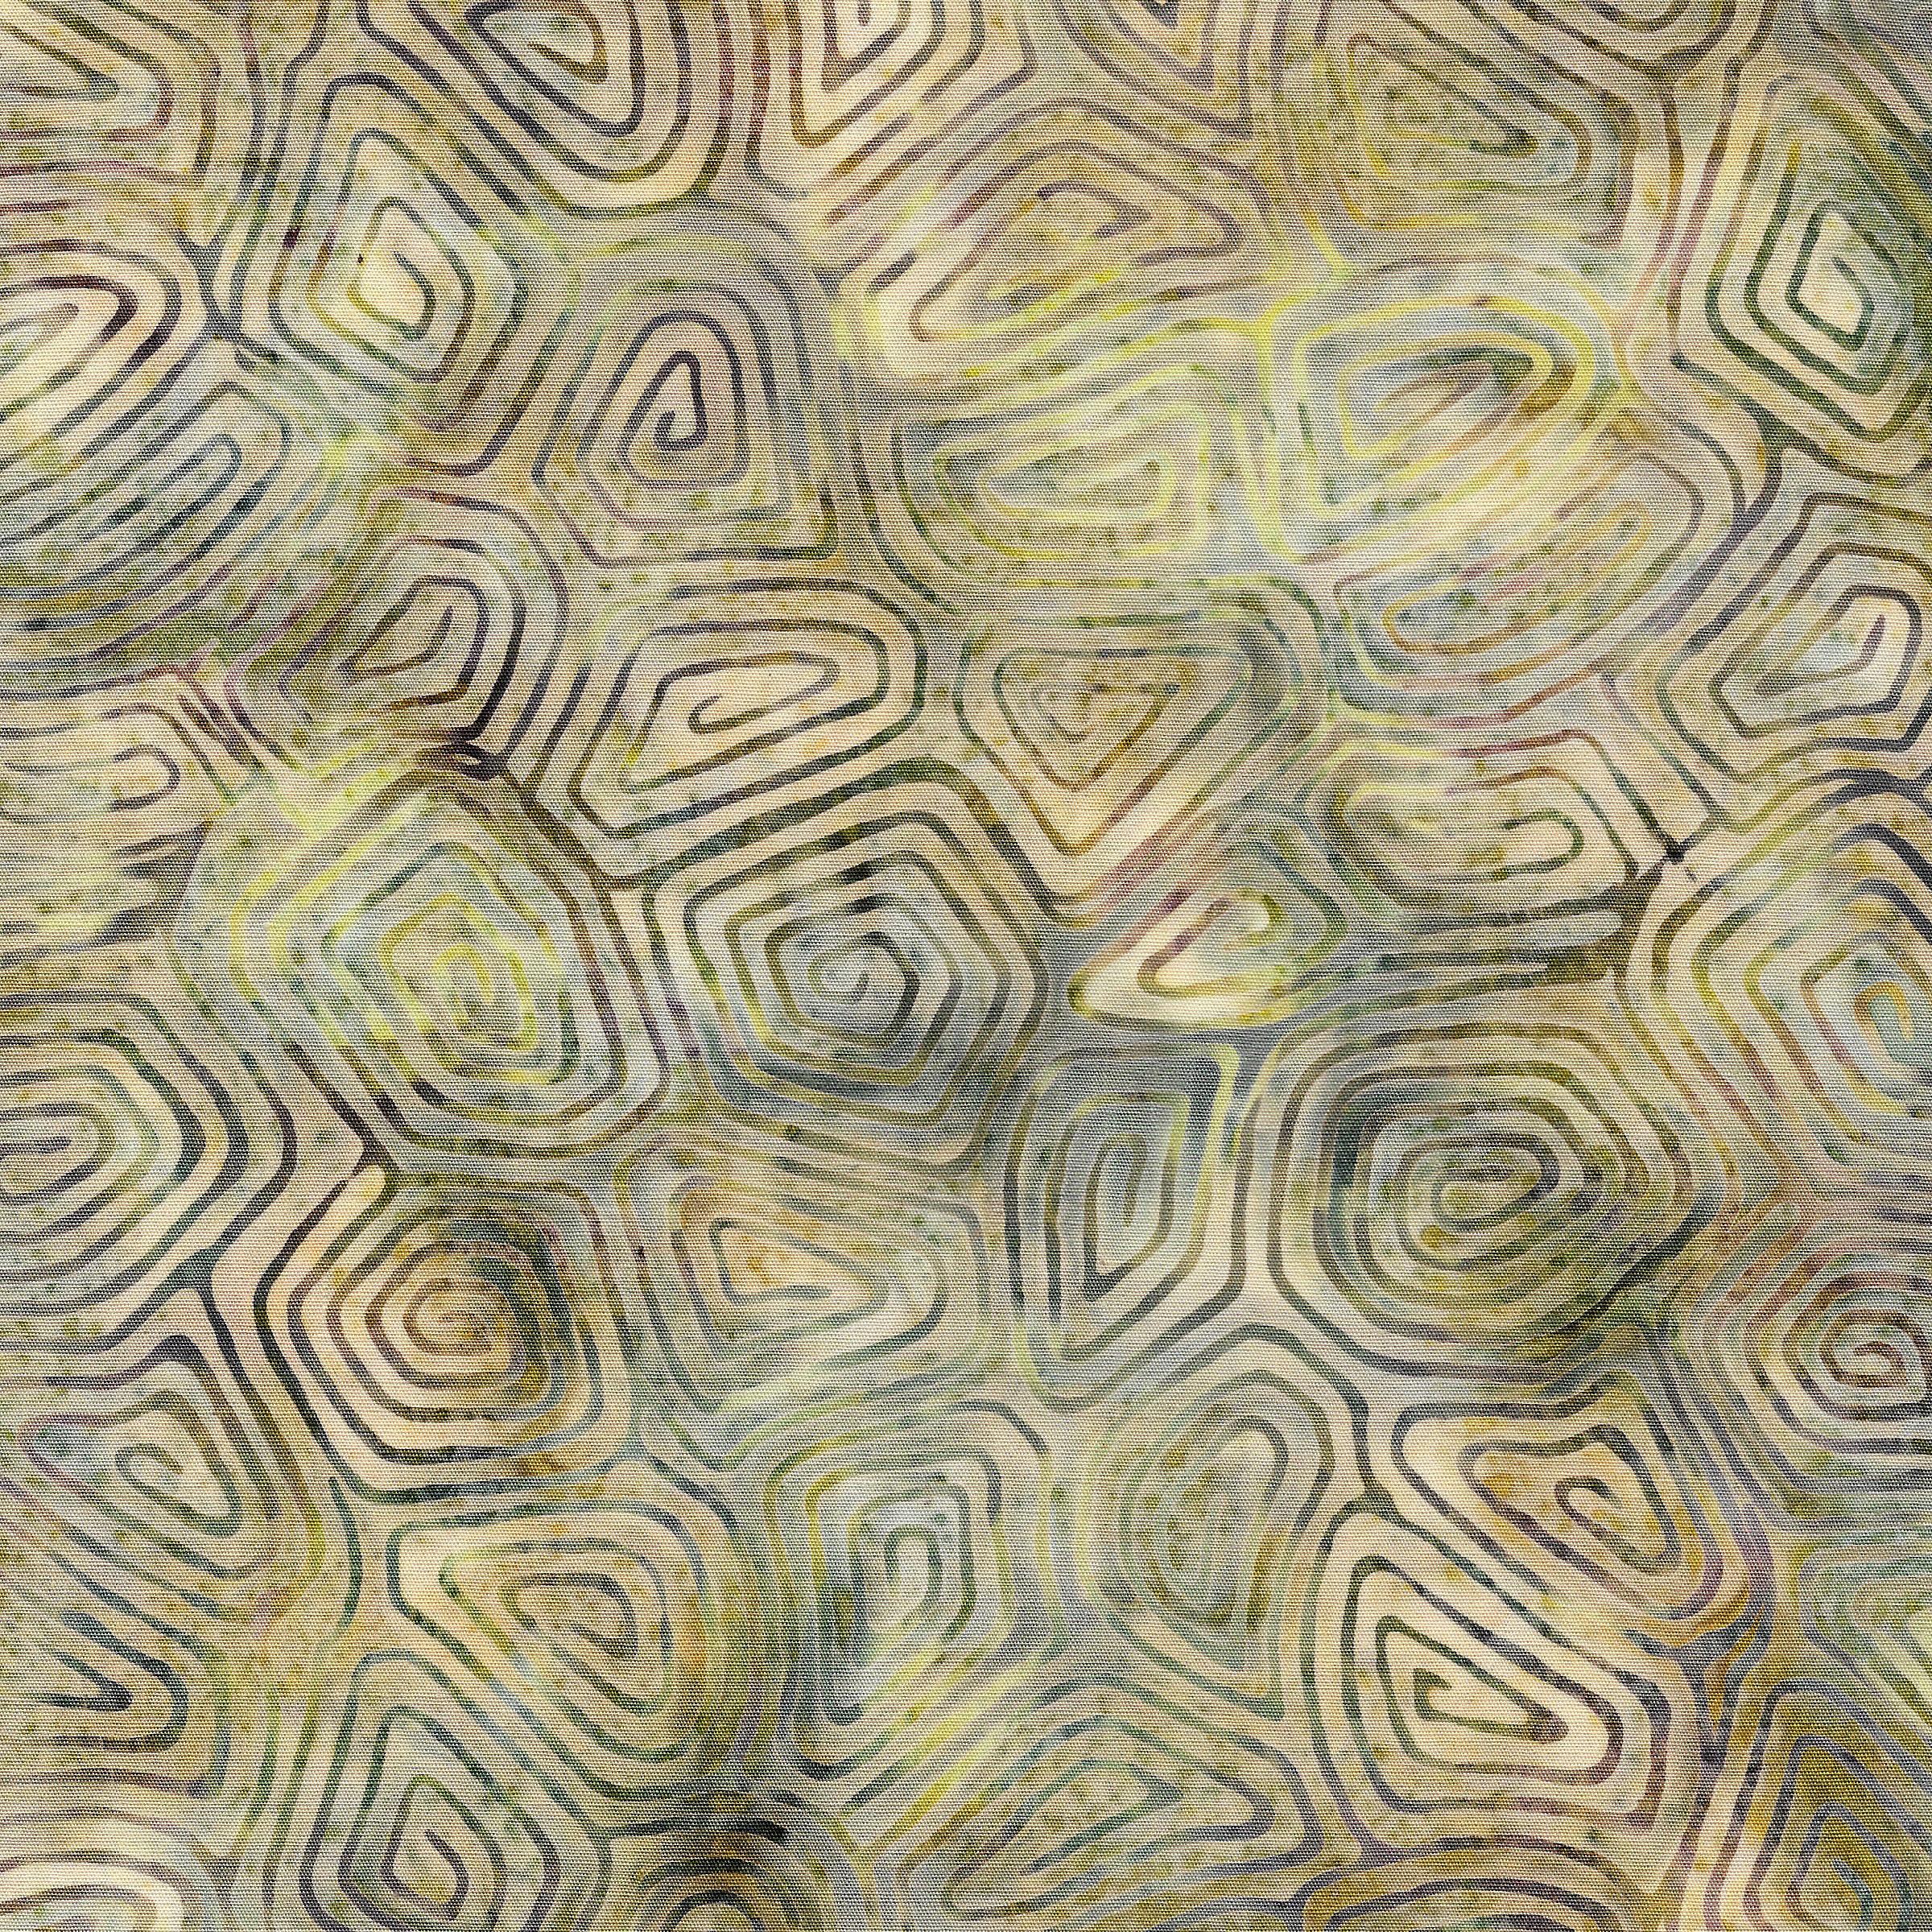 111902805 / Turtle Shell-Pond Moss